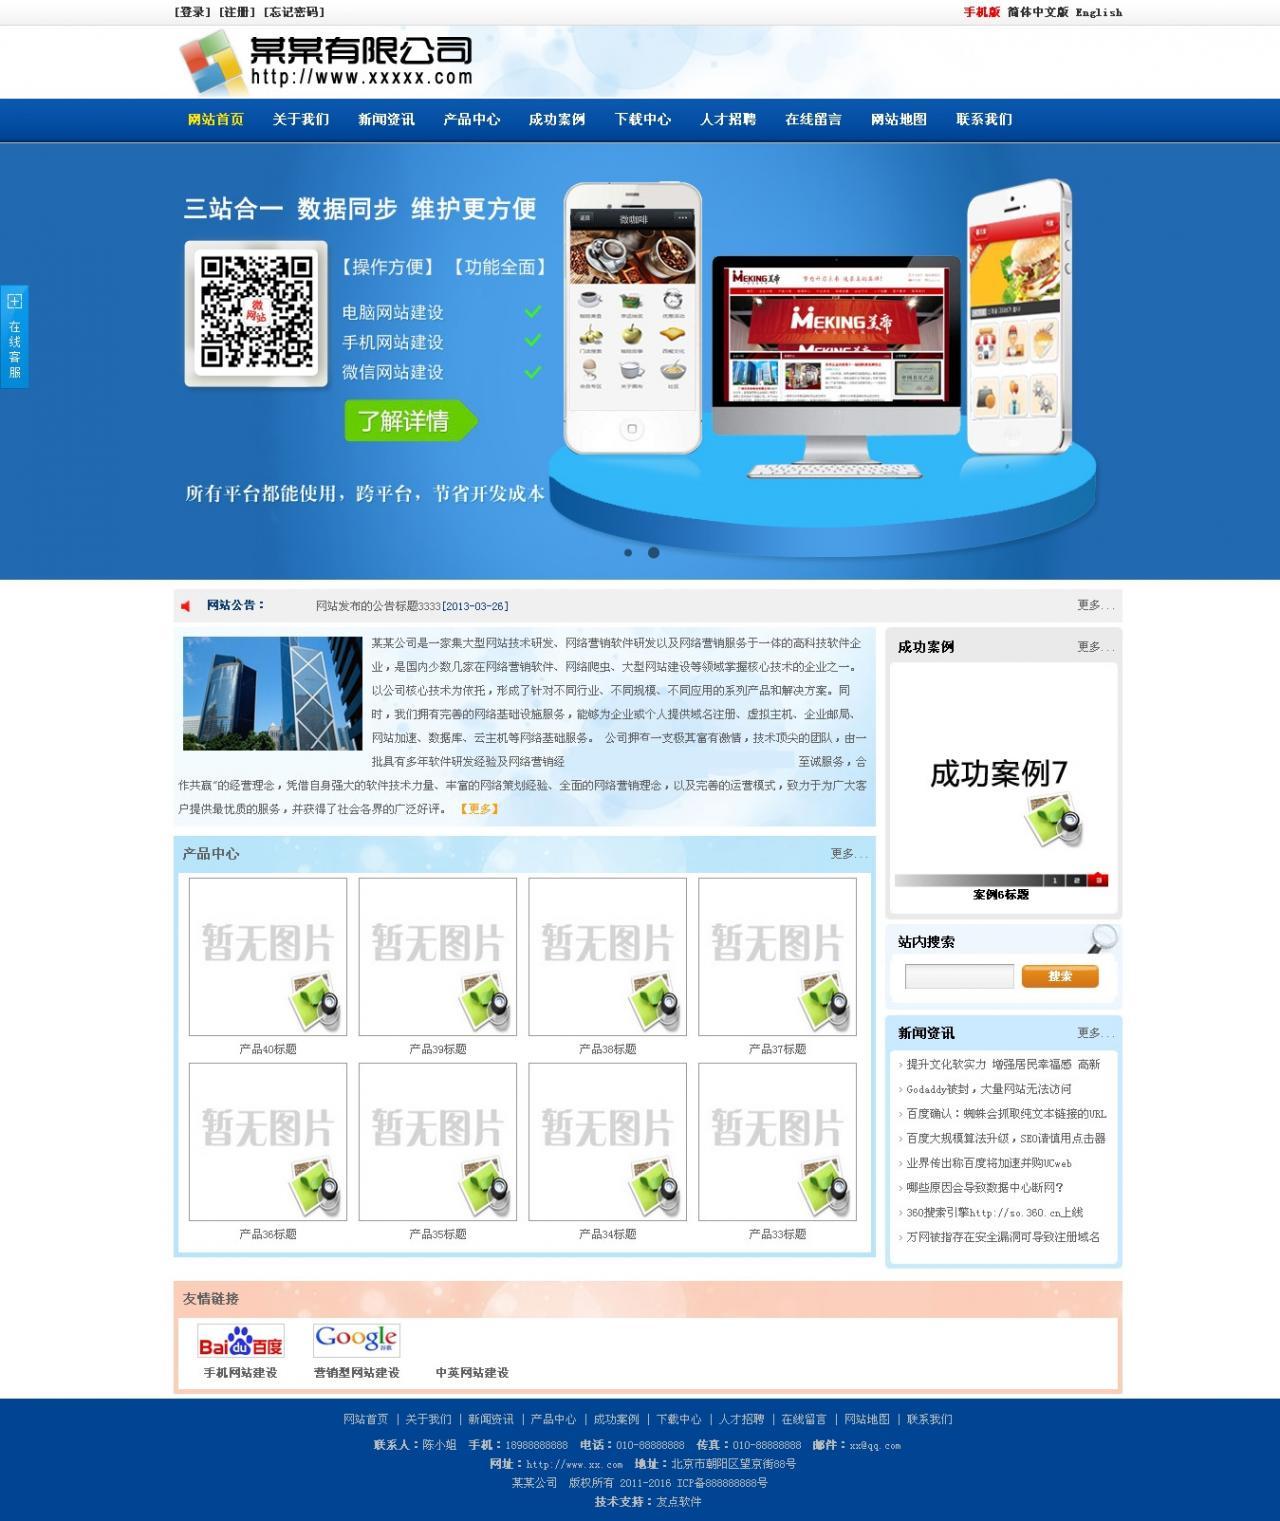 【YouDianCMS v9.1】 开源五合一建站系统+友点企业网站管理系统+数据自动同步